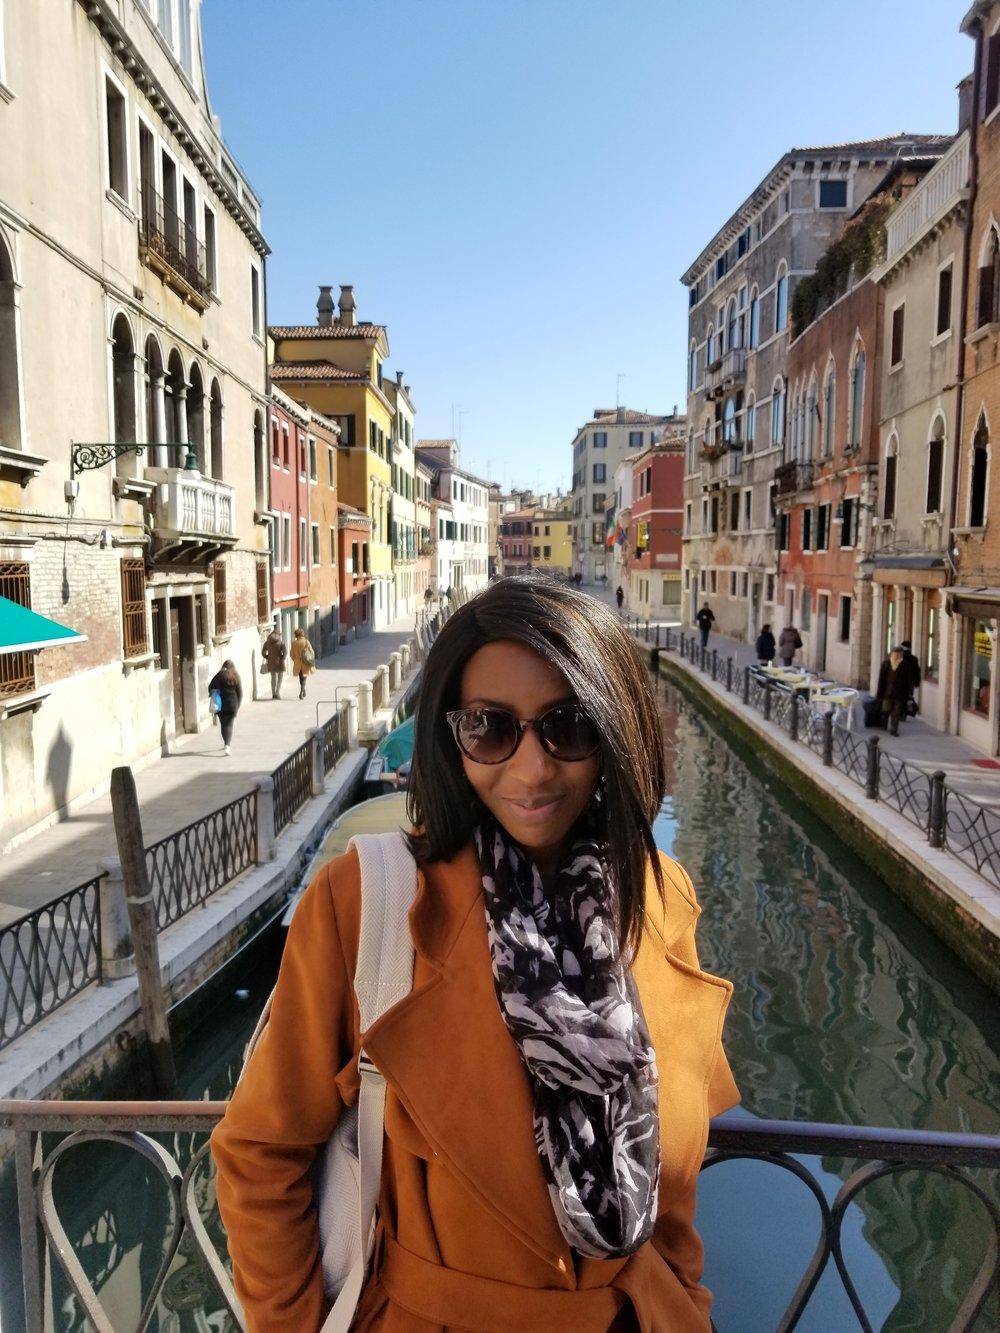 In beautiful Venice, Italy